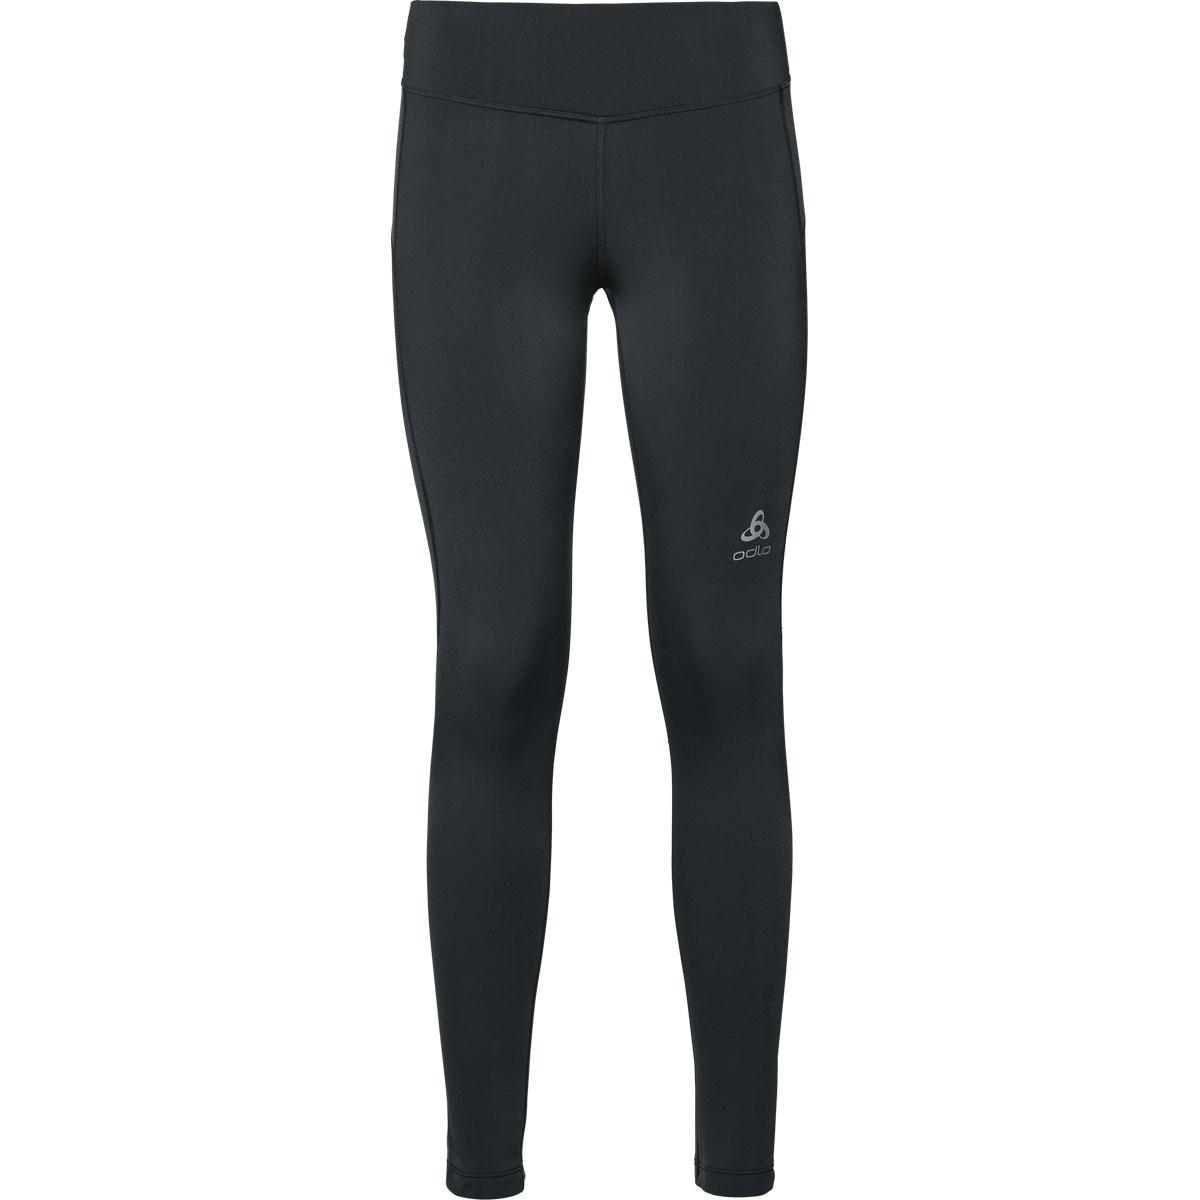 Odlo Running-Tight BOTTOM LONG CORE Warm Lady | 322071-15000